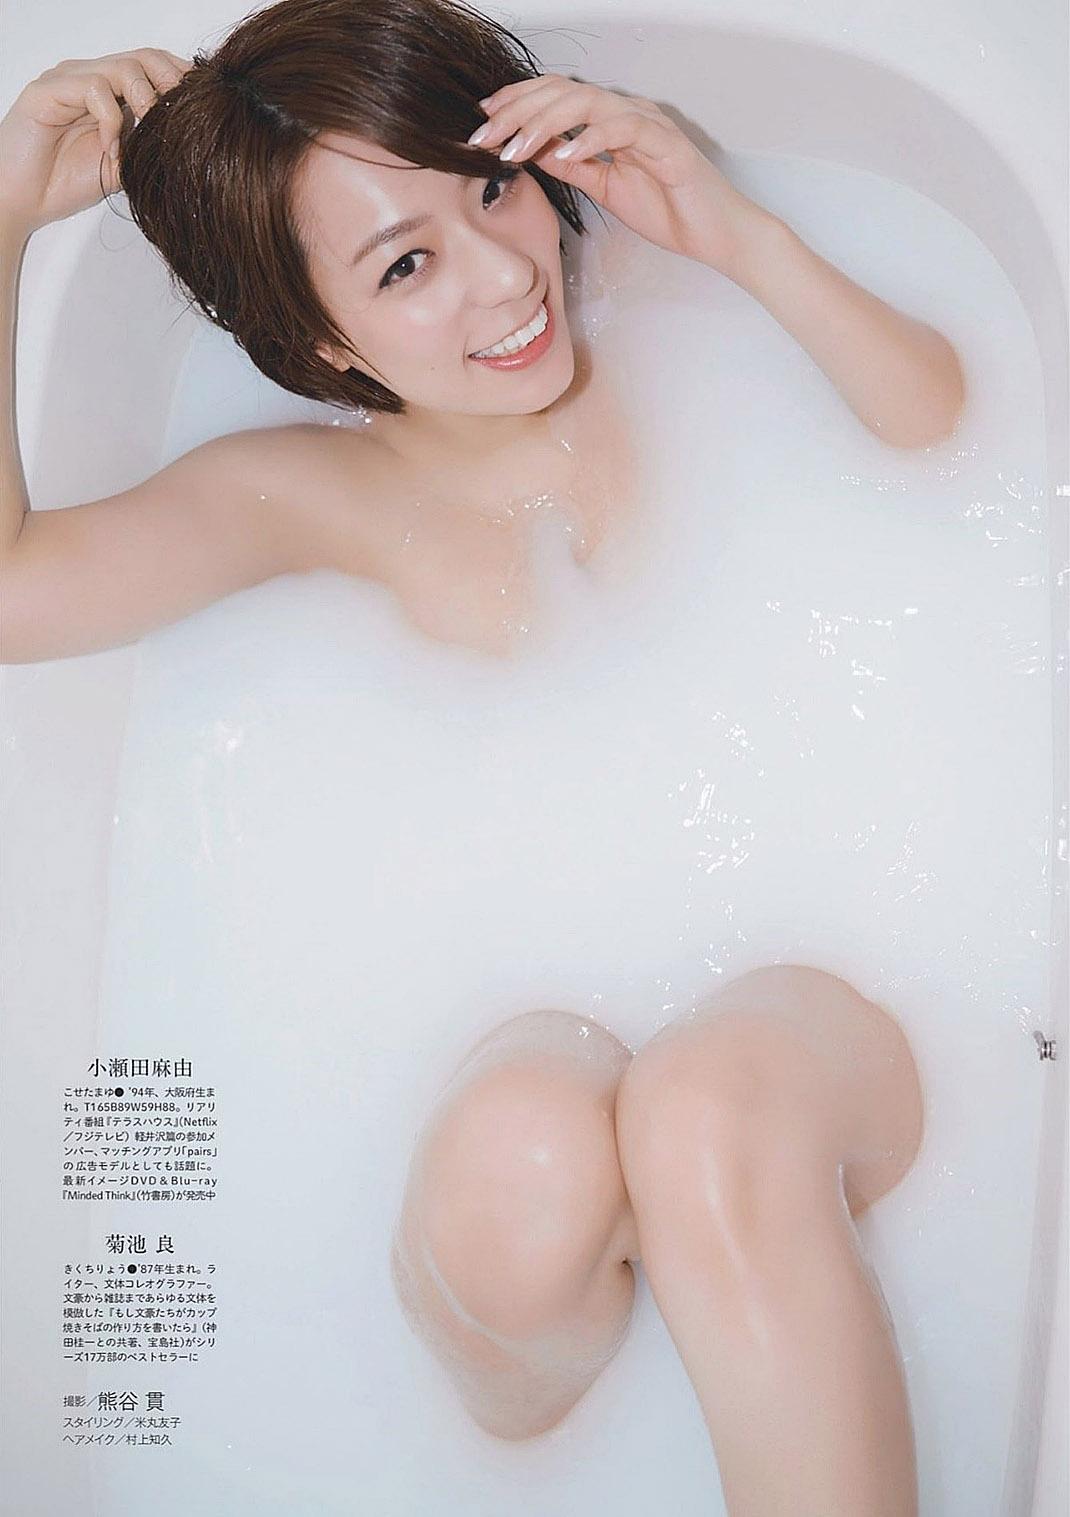 Mayu Koseta Girls 3 2019 12.jpg